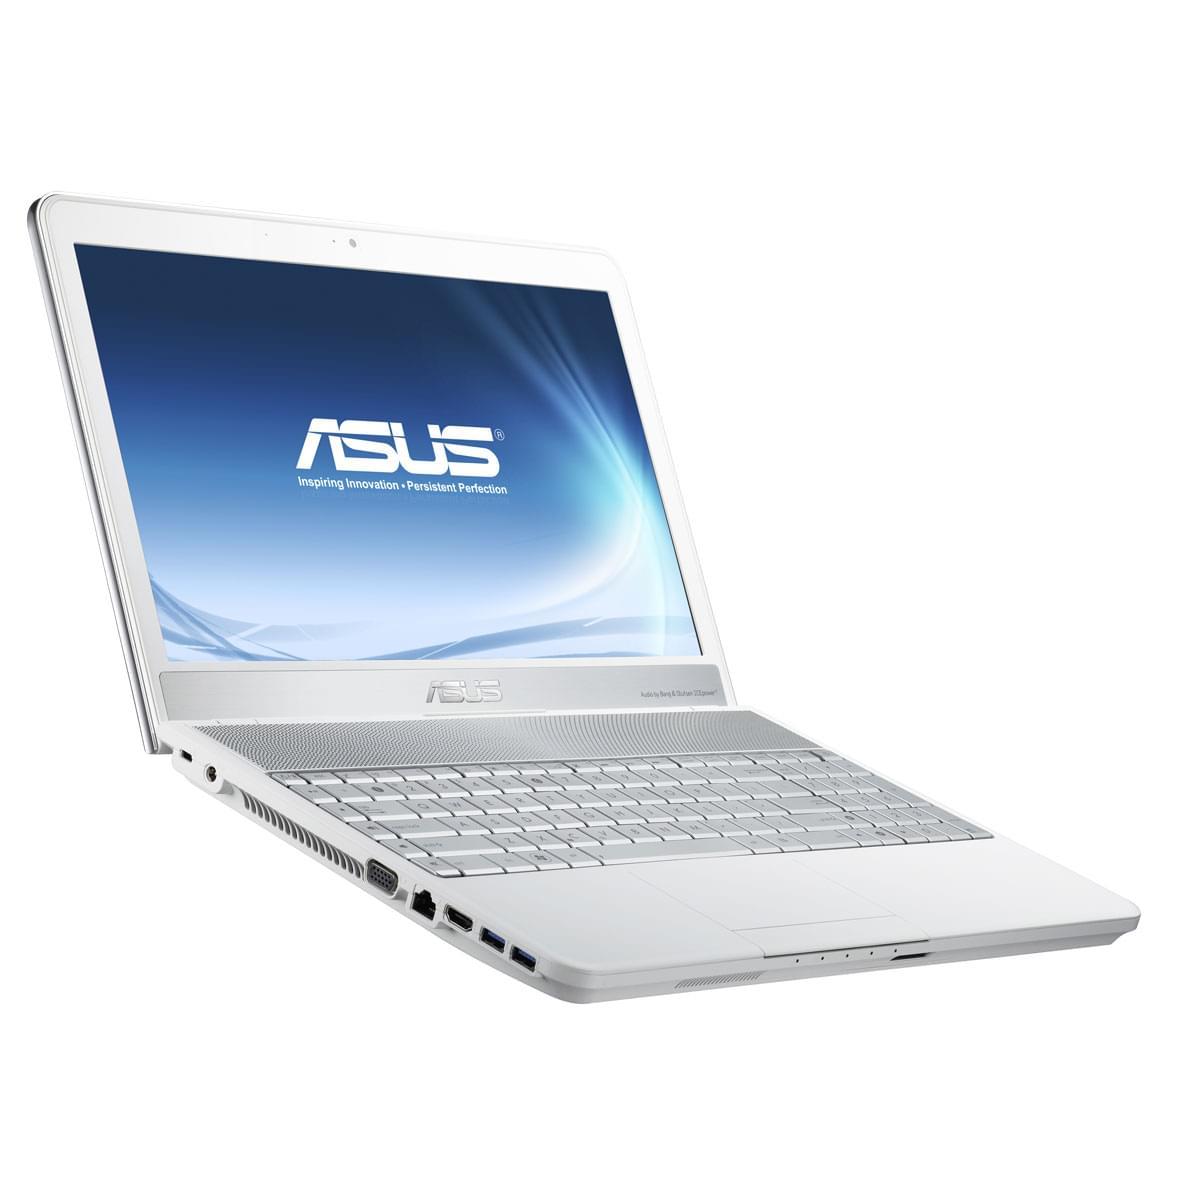 Asus N55SL-S2118V (N55SL-S2118V) - Achat / Vente PC Portable sur Cybertek.fr - 0